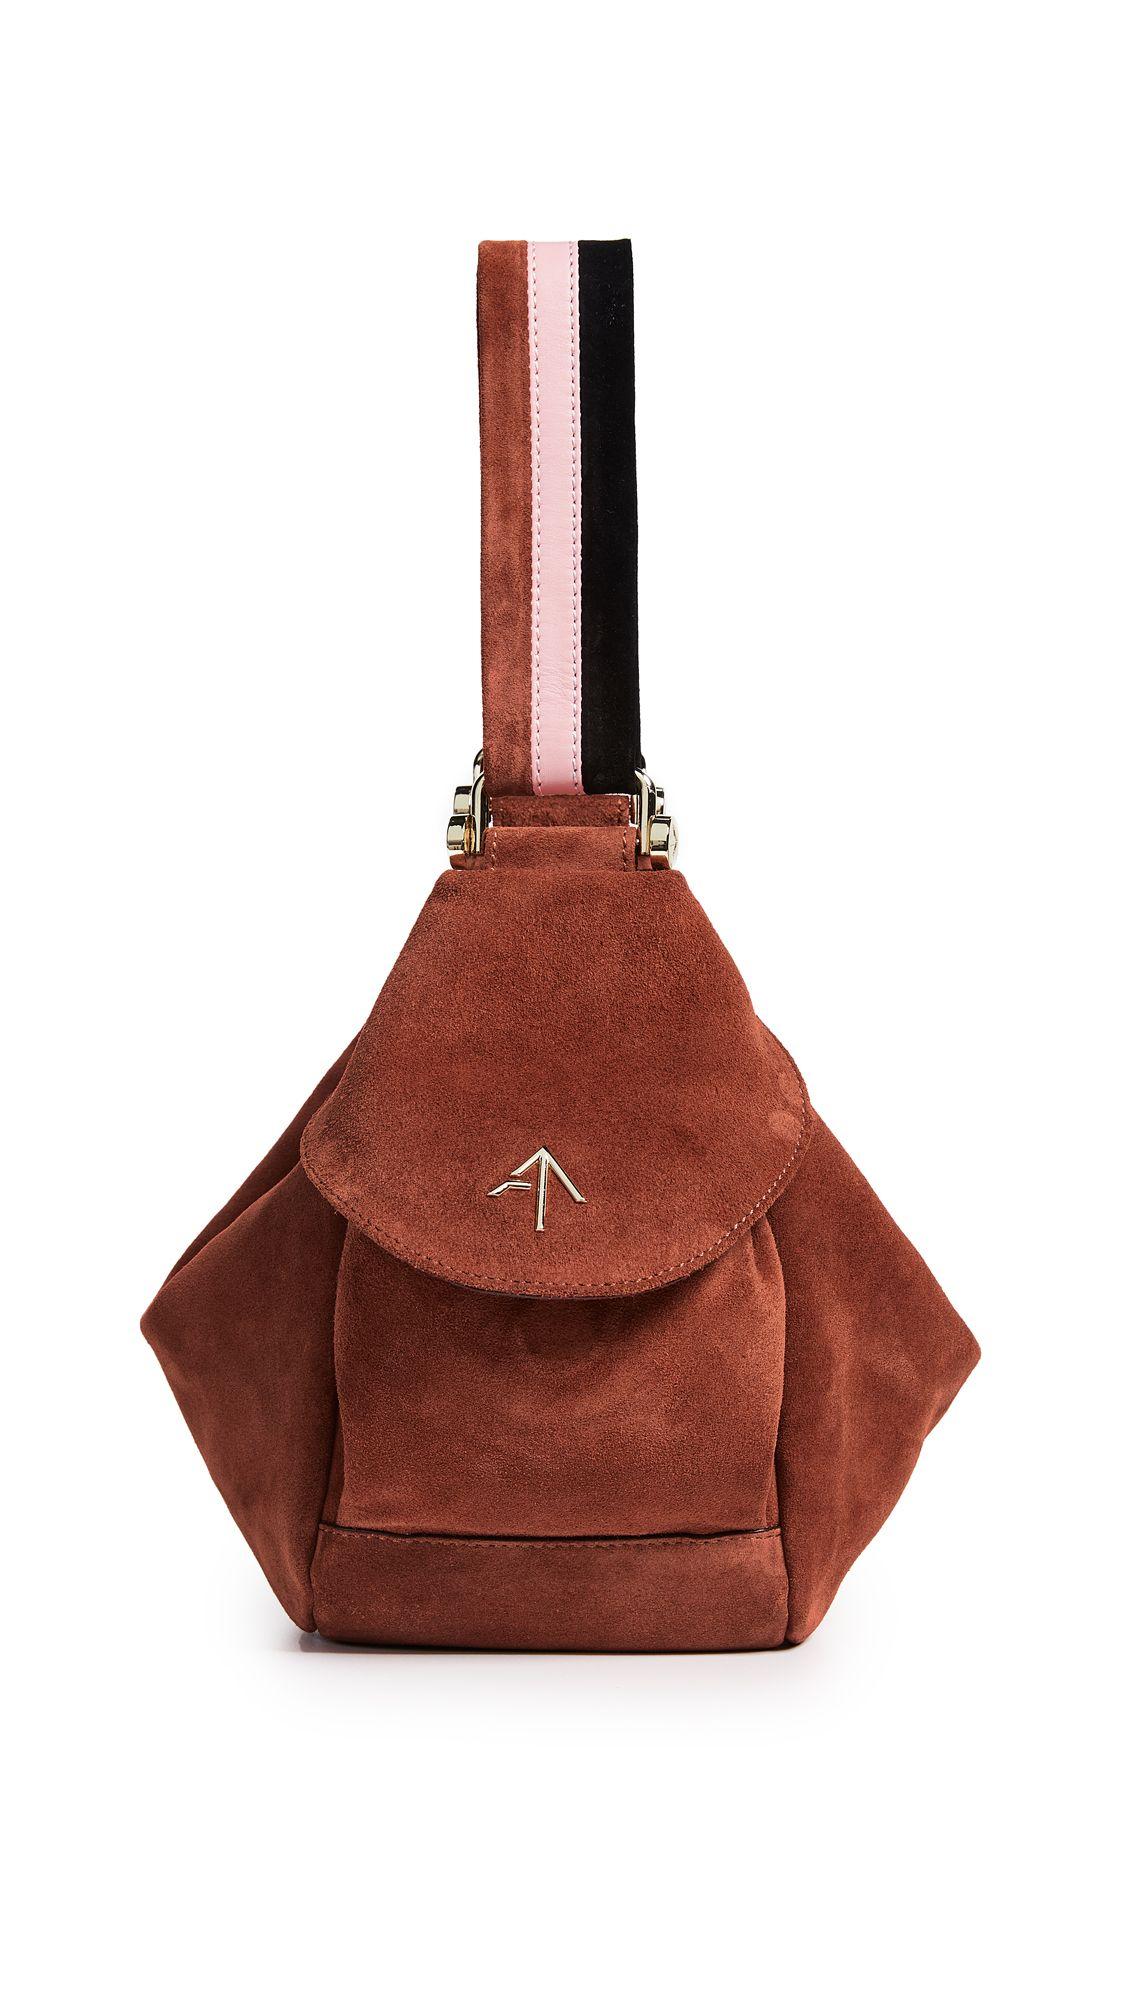 f95fcb35b1 MANU ATELIER SUEDE MICRO FERNWEH CONVERTIBLE BAG.  manuatelier  bags  shoulder  bags  hand bags  suede